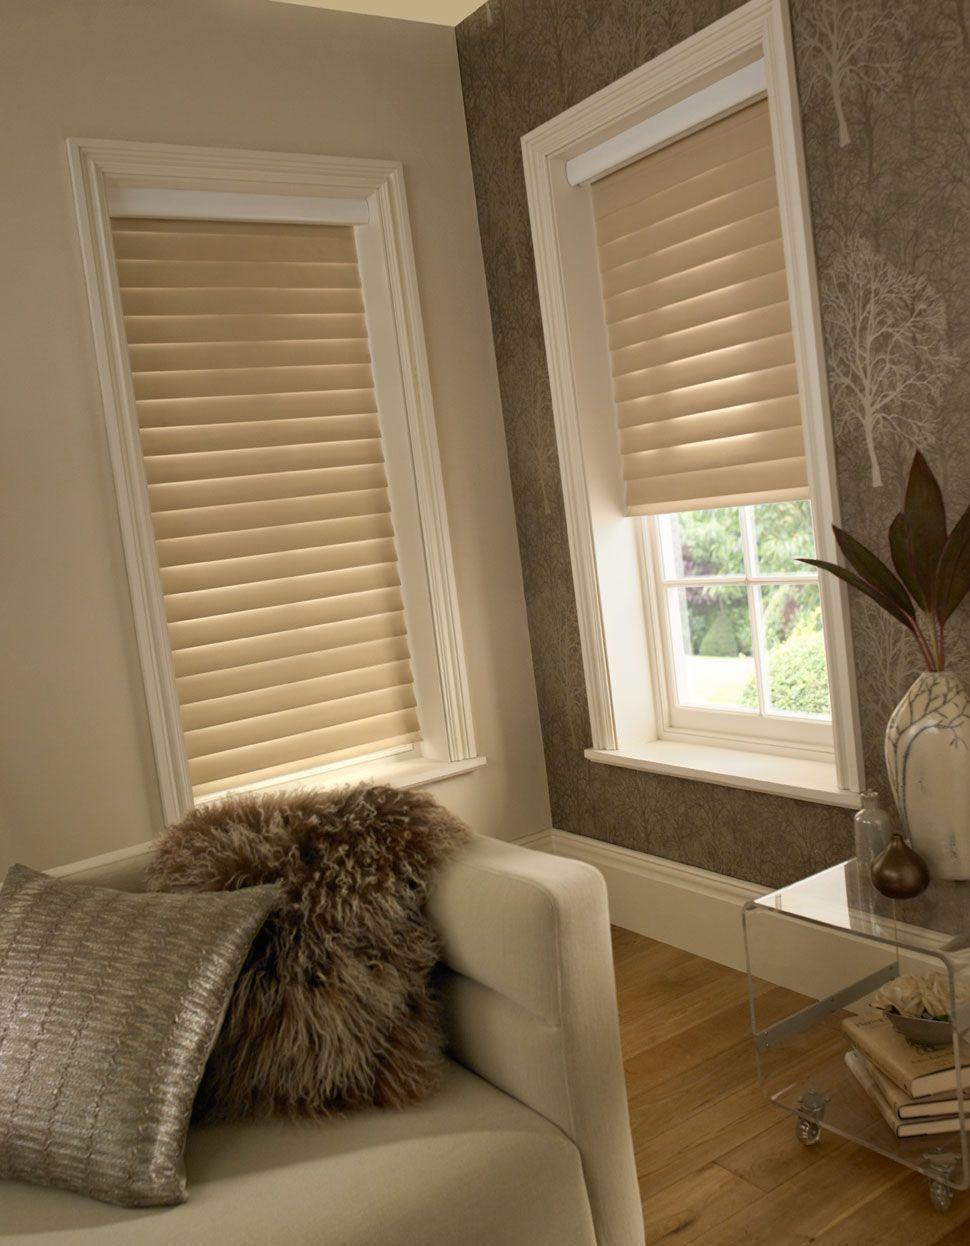 Bamboo house window design   marvelous tips diy blinds watches dark grey blindssheer vertical